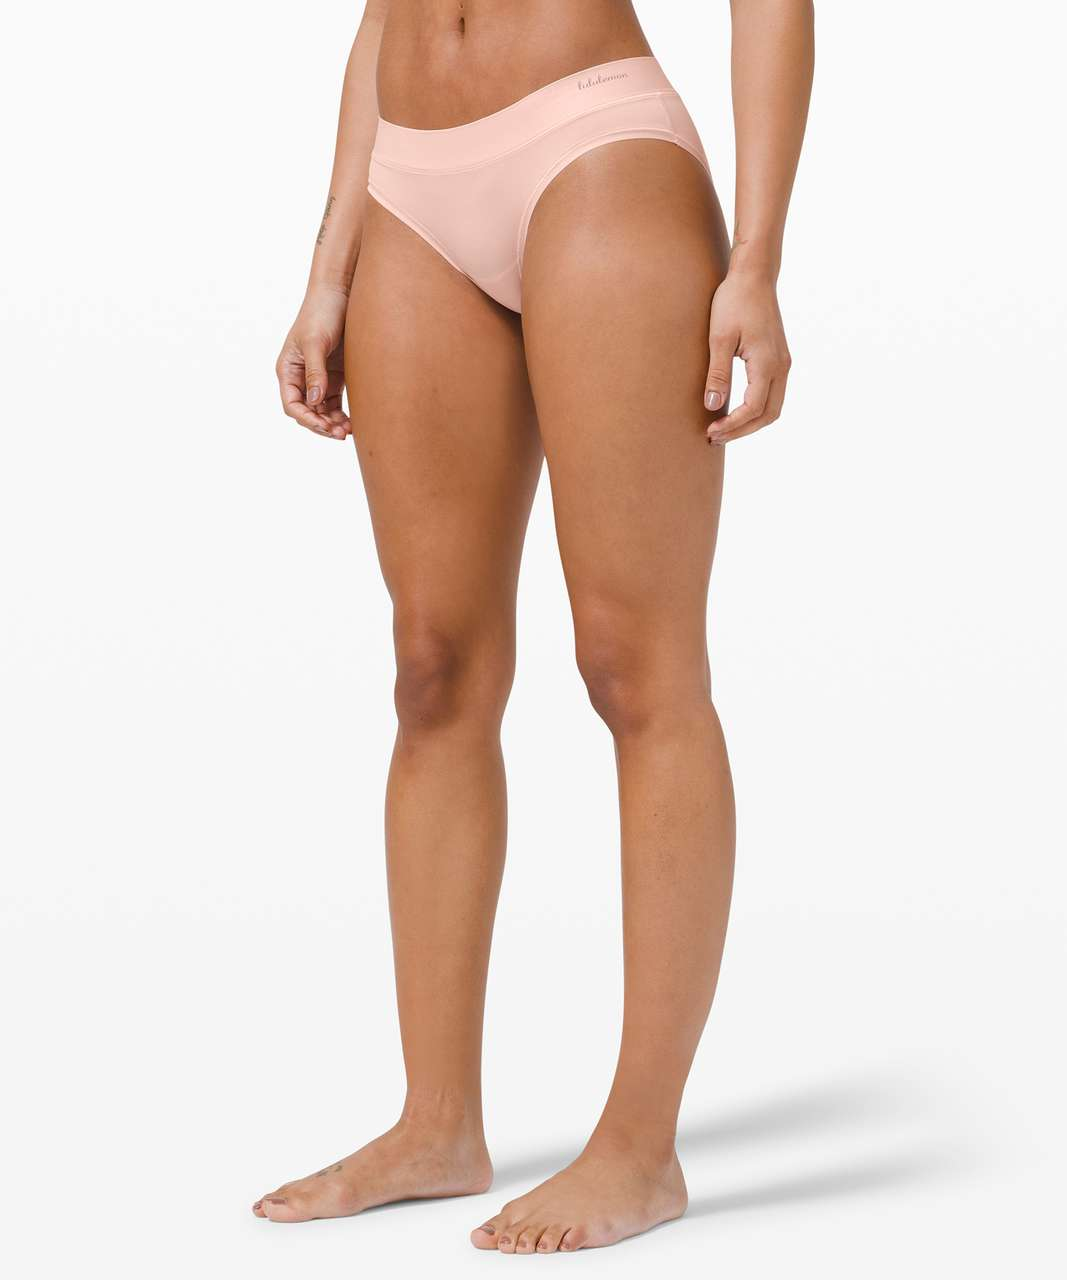 Lululemon Soft Breathable Bikini *3 Pack - Lavender Dew / Pink Mist / Rhino Grey